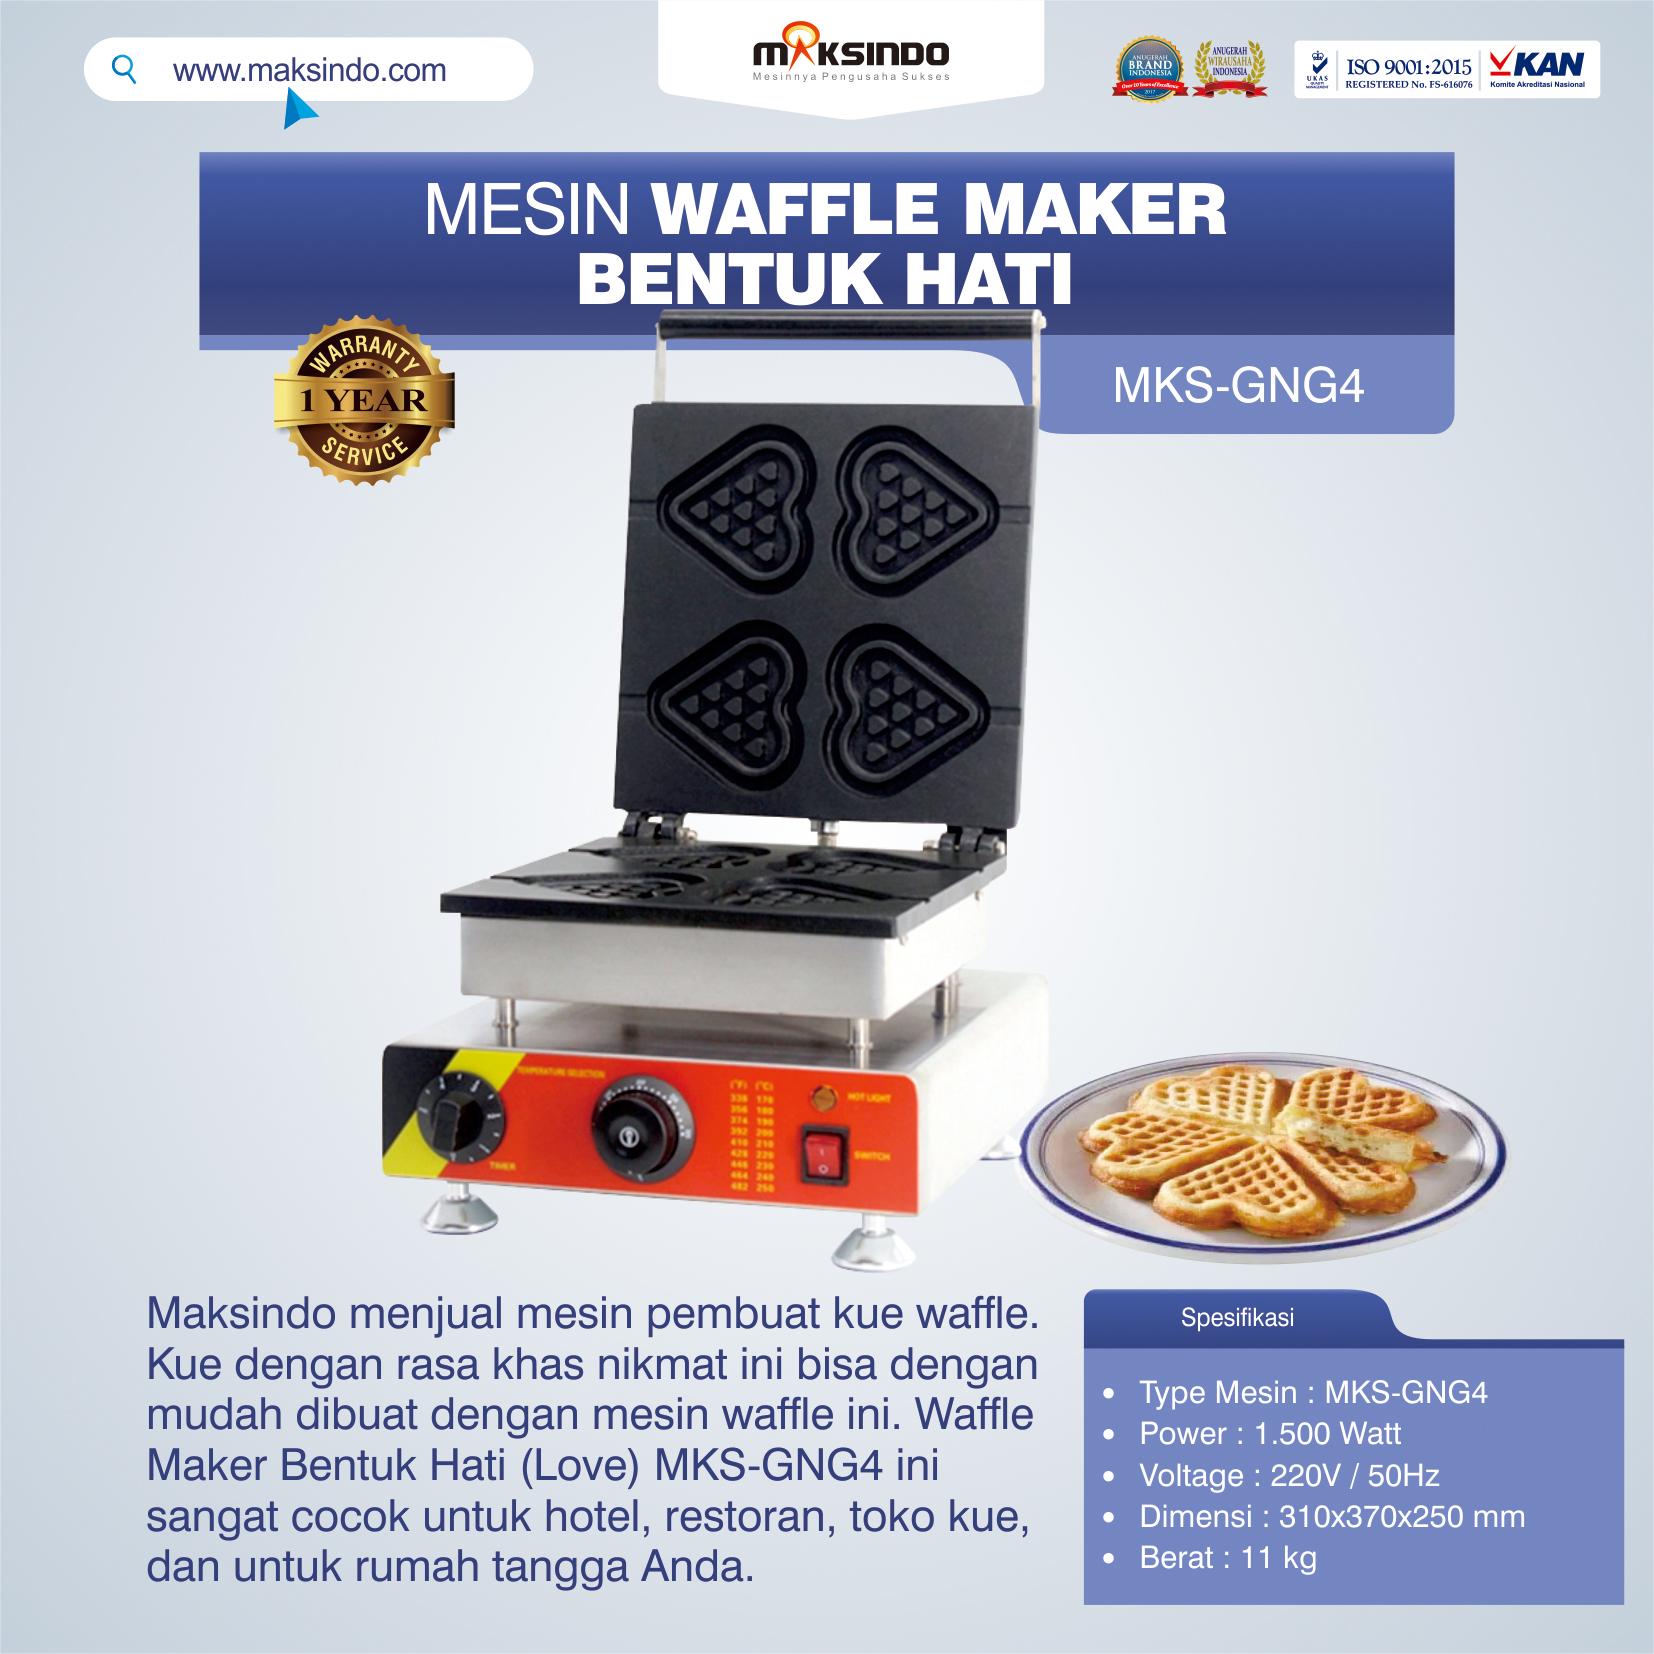 Jual Mesin Waffle Maker Bentuk Hati (Love) MKS-GNG4 di Solo